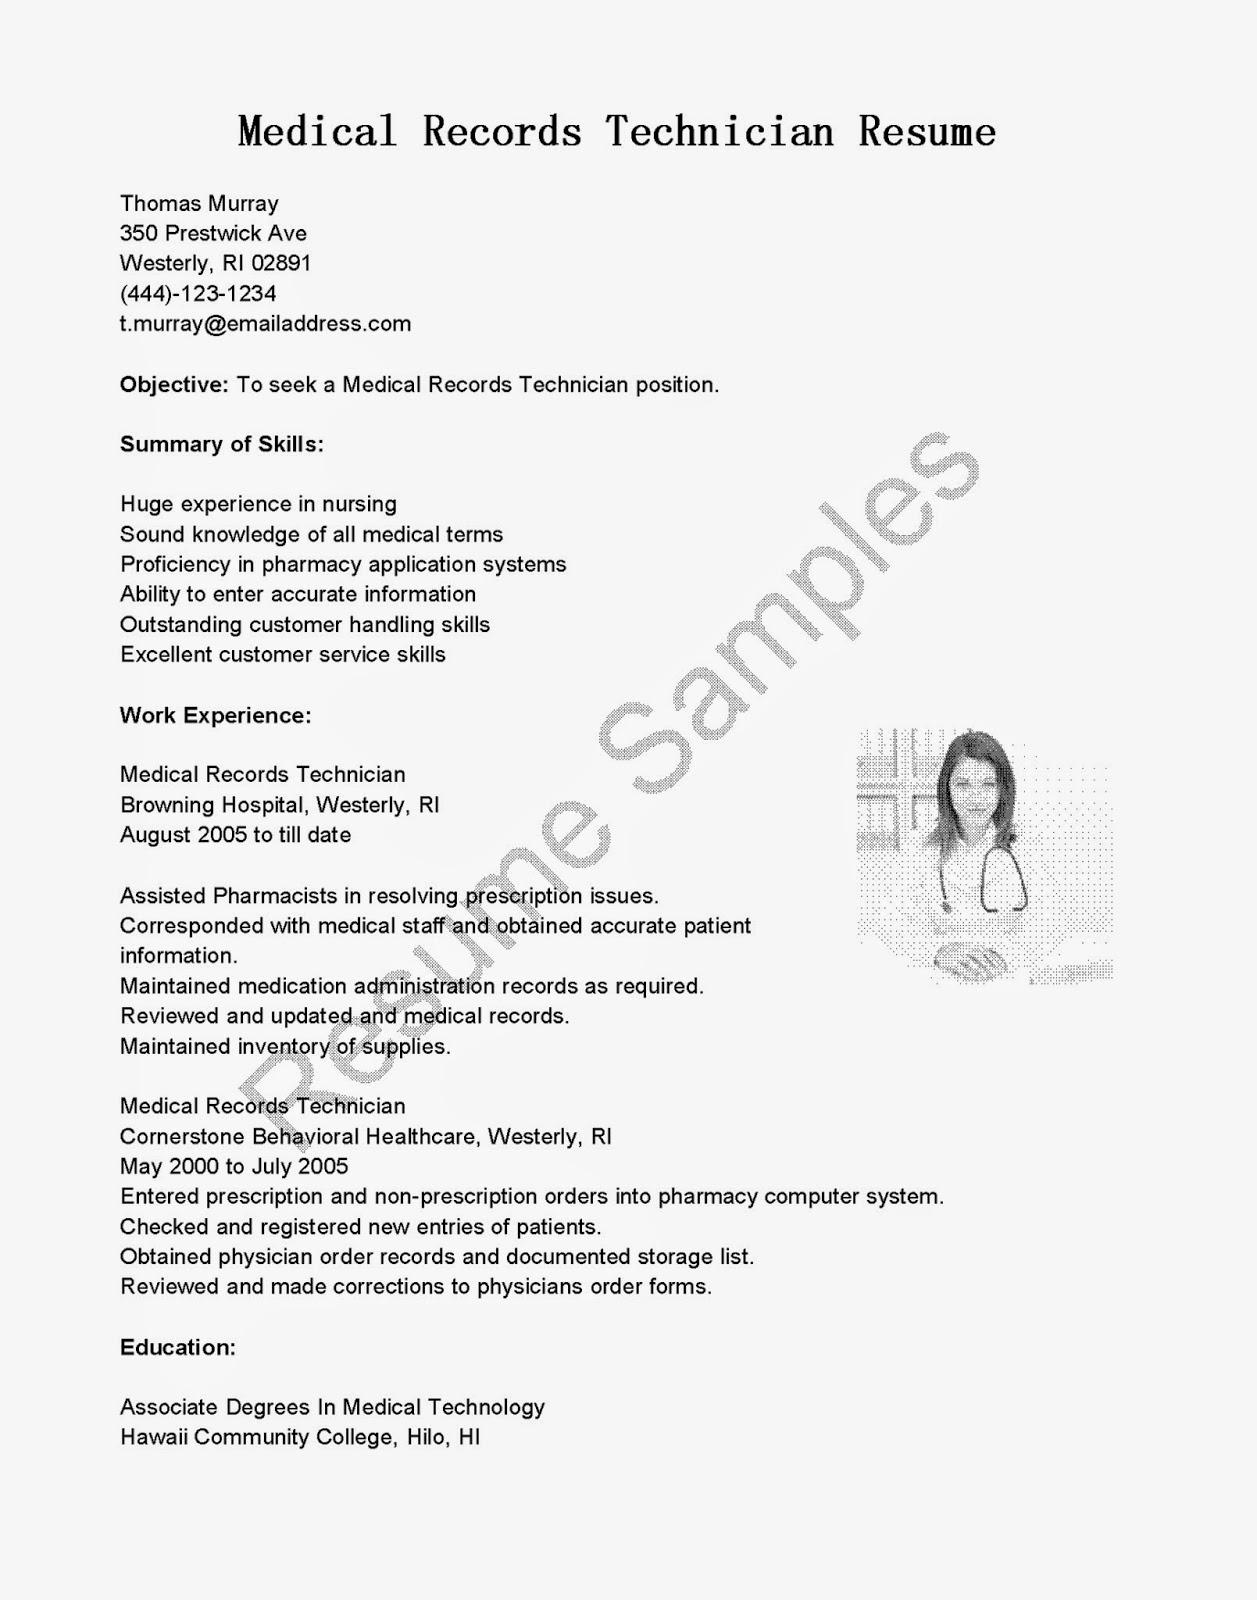 Resume Samples Medical Records Technician Resume Sample